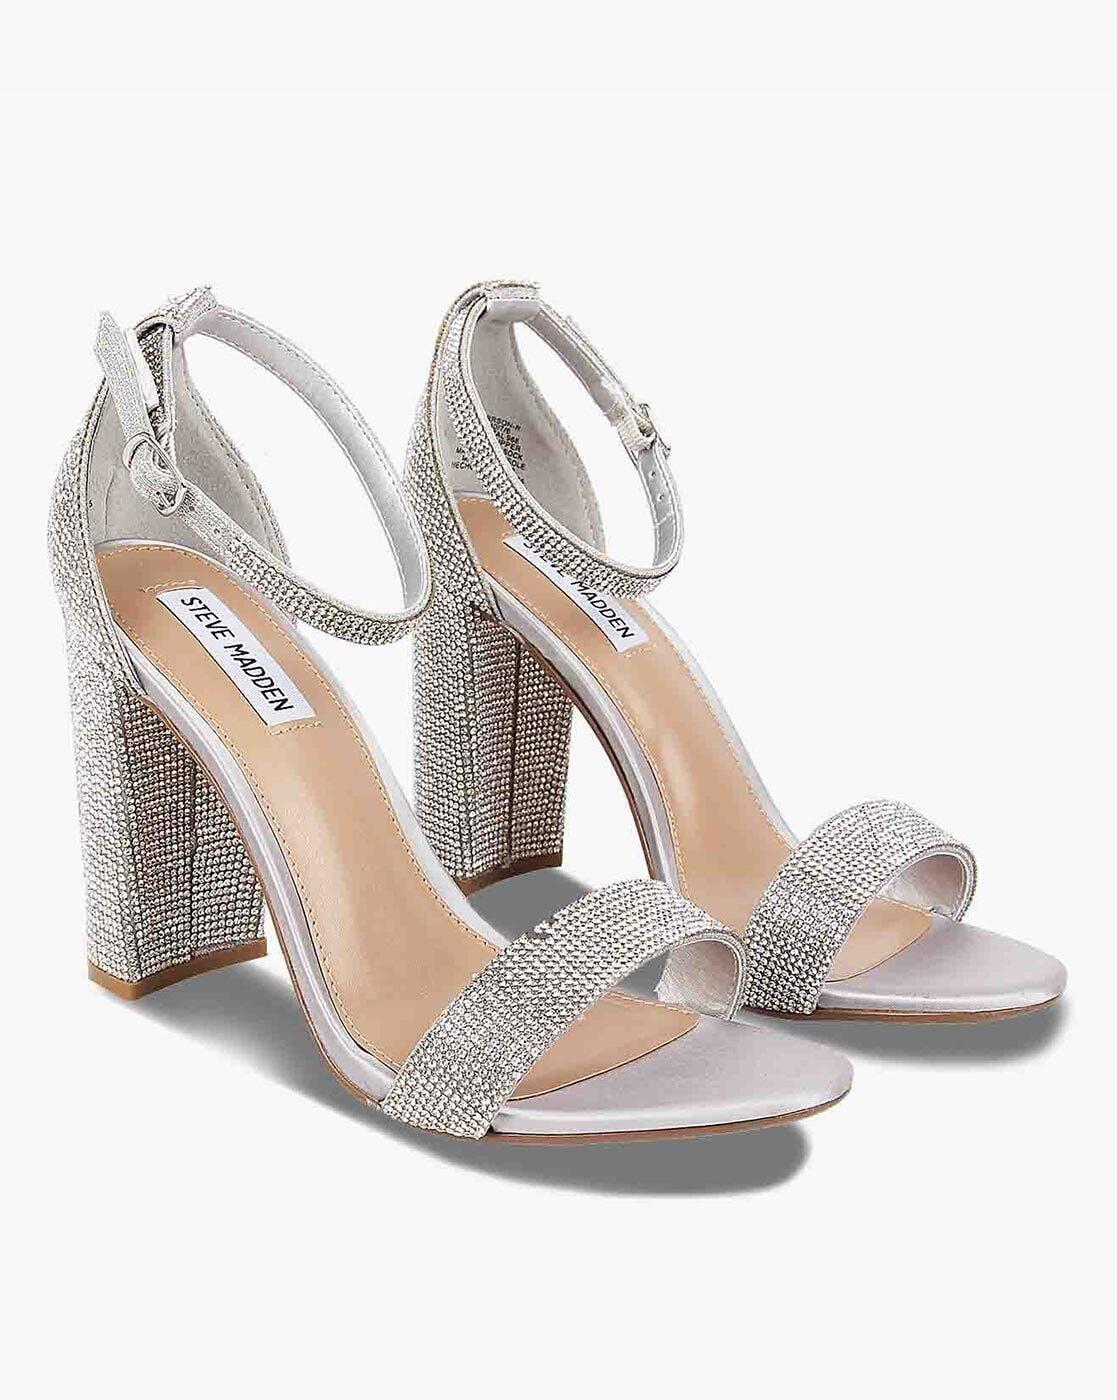 steve madden heels silver